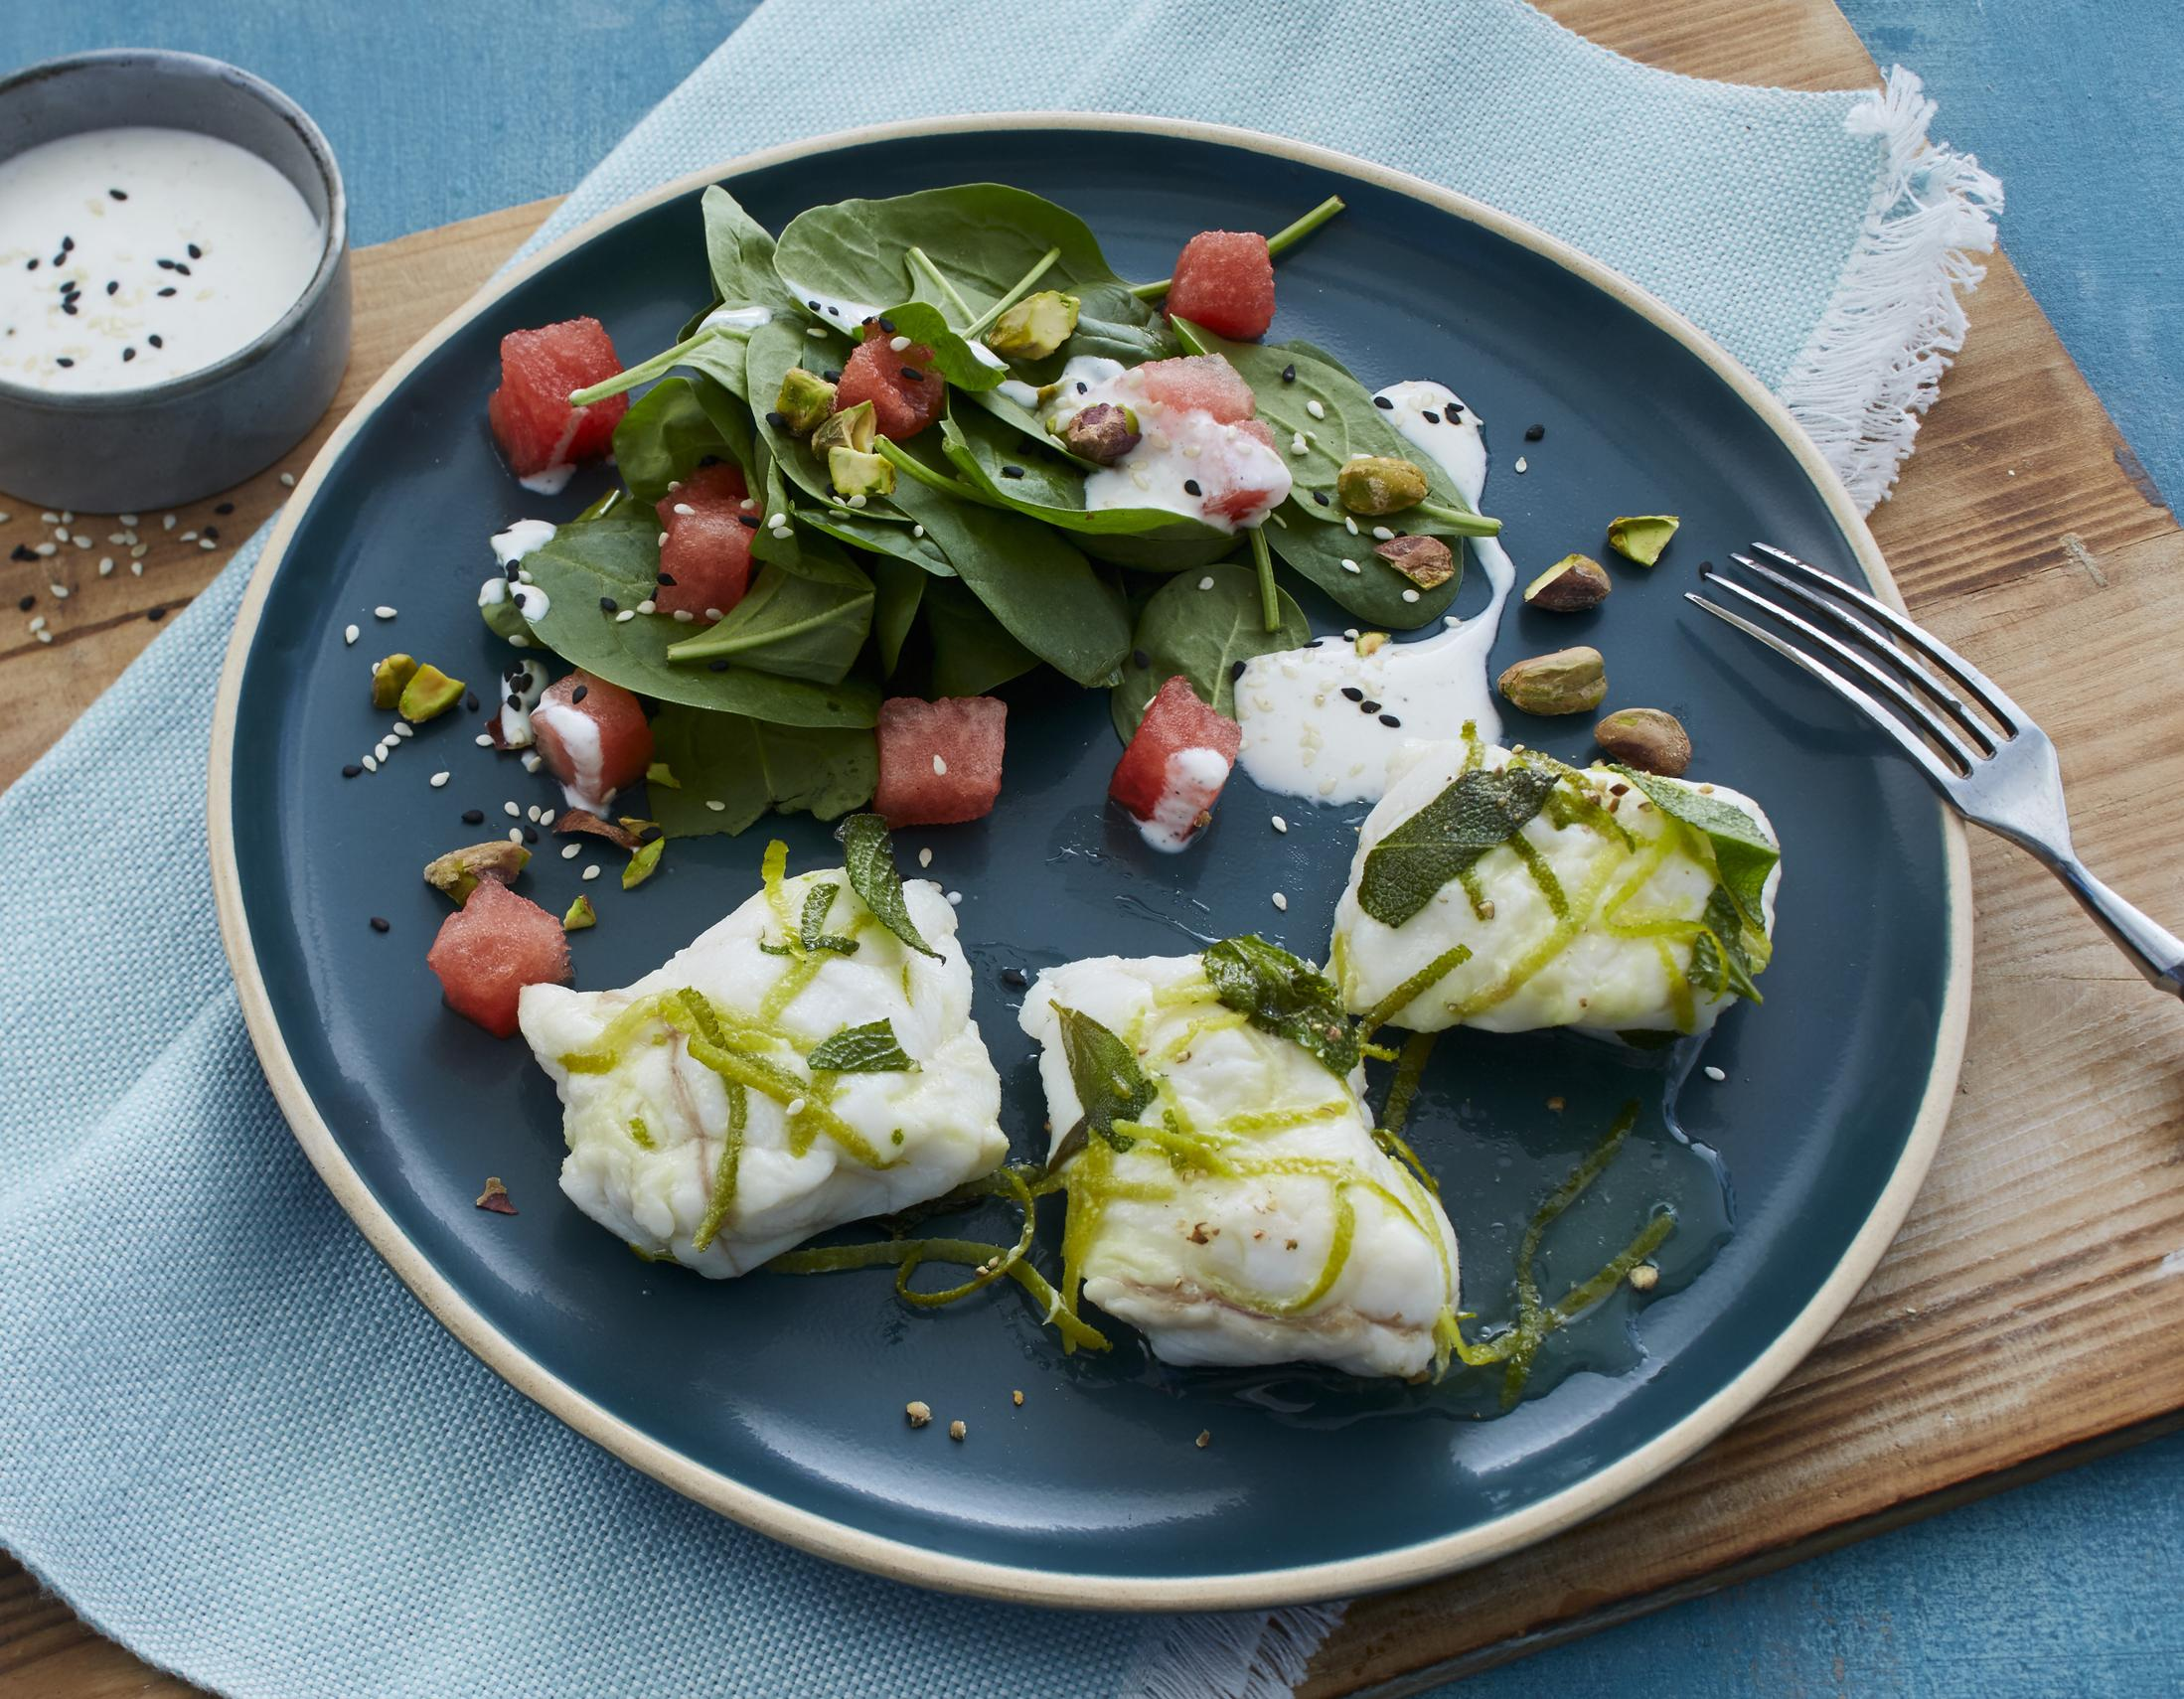 Seeteufel Sous-vide mit Spinat-Melonen-Salat